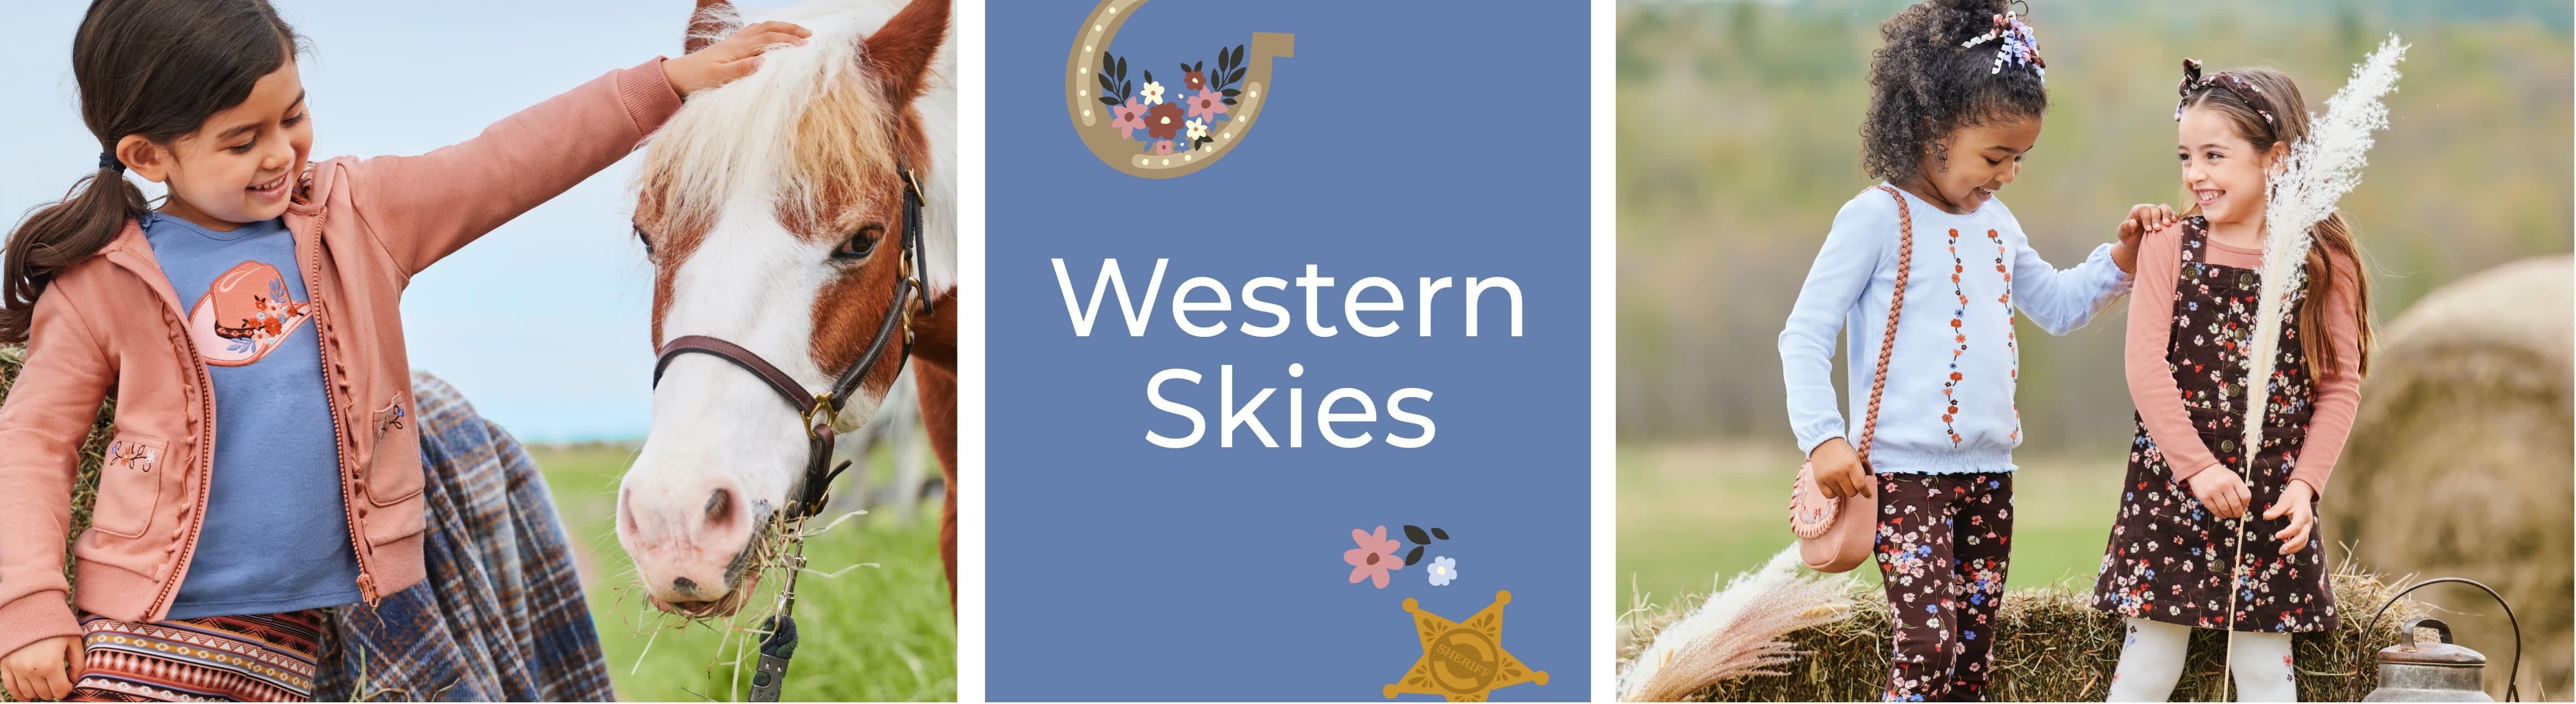 Chica cielos occidentales